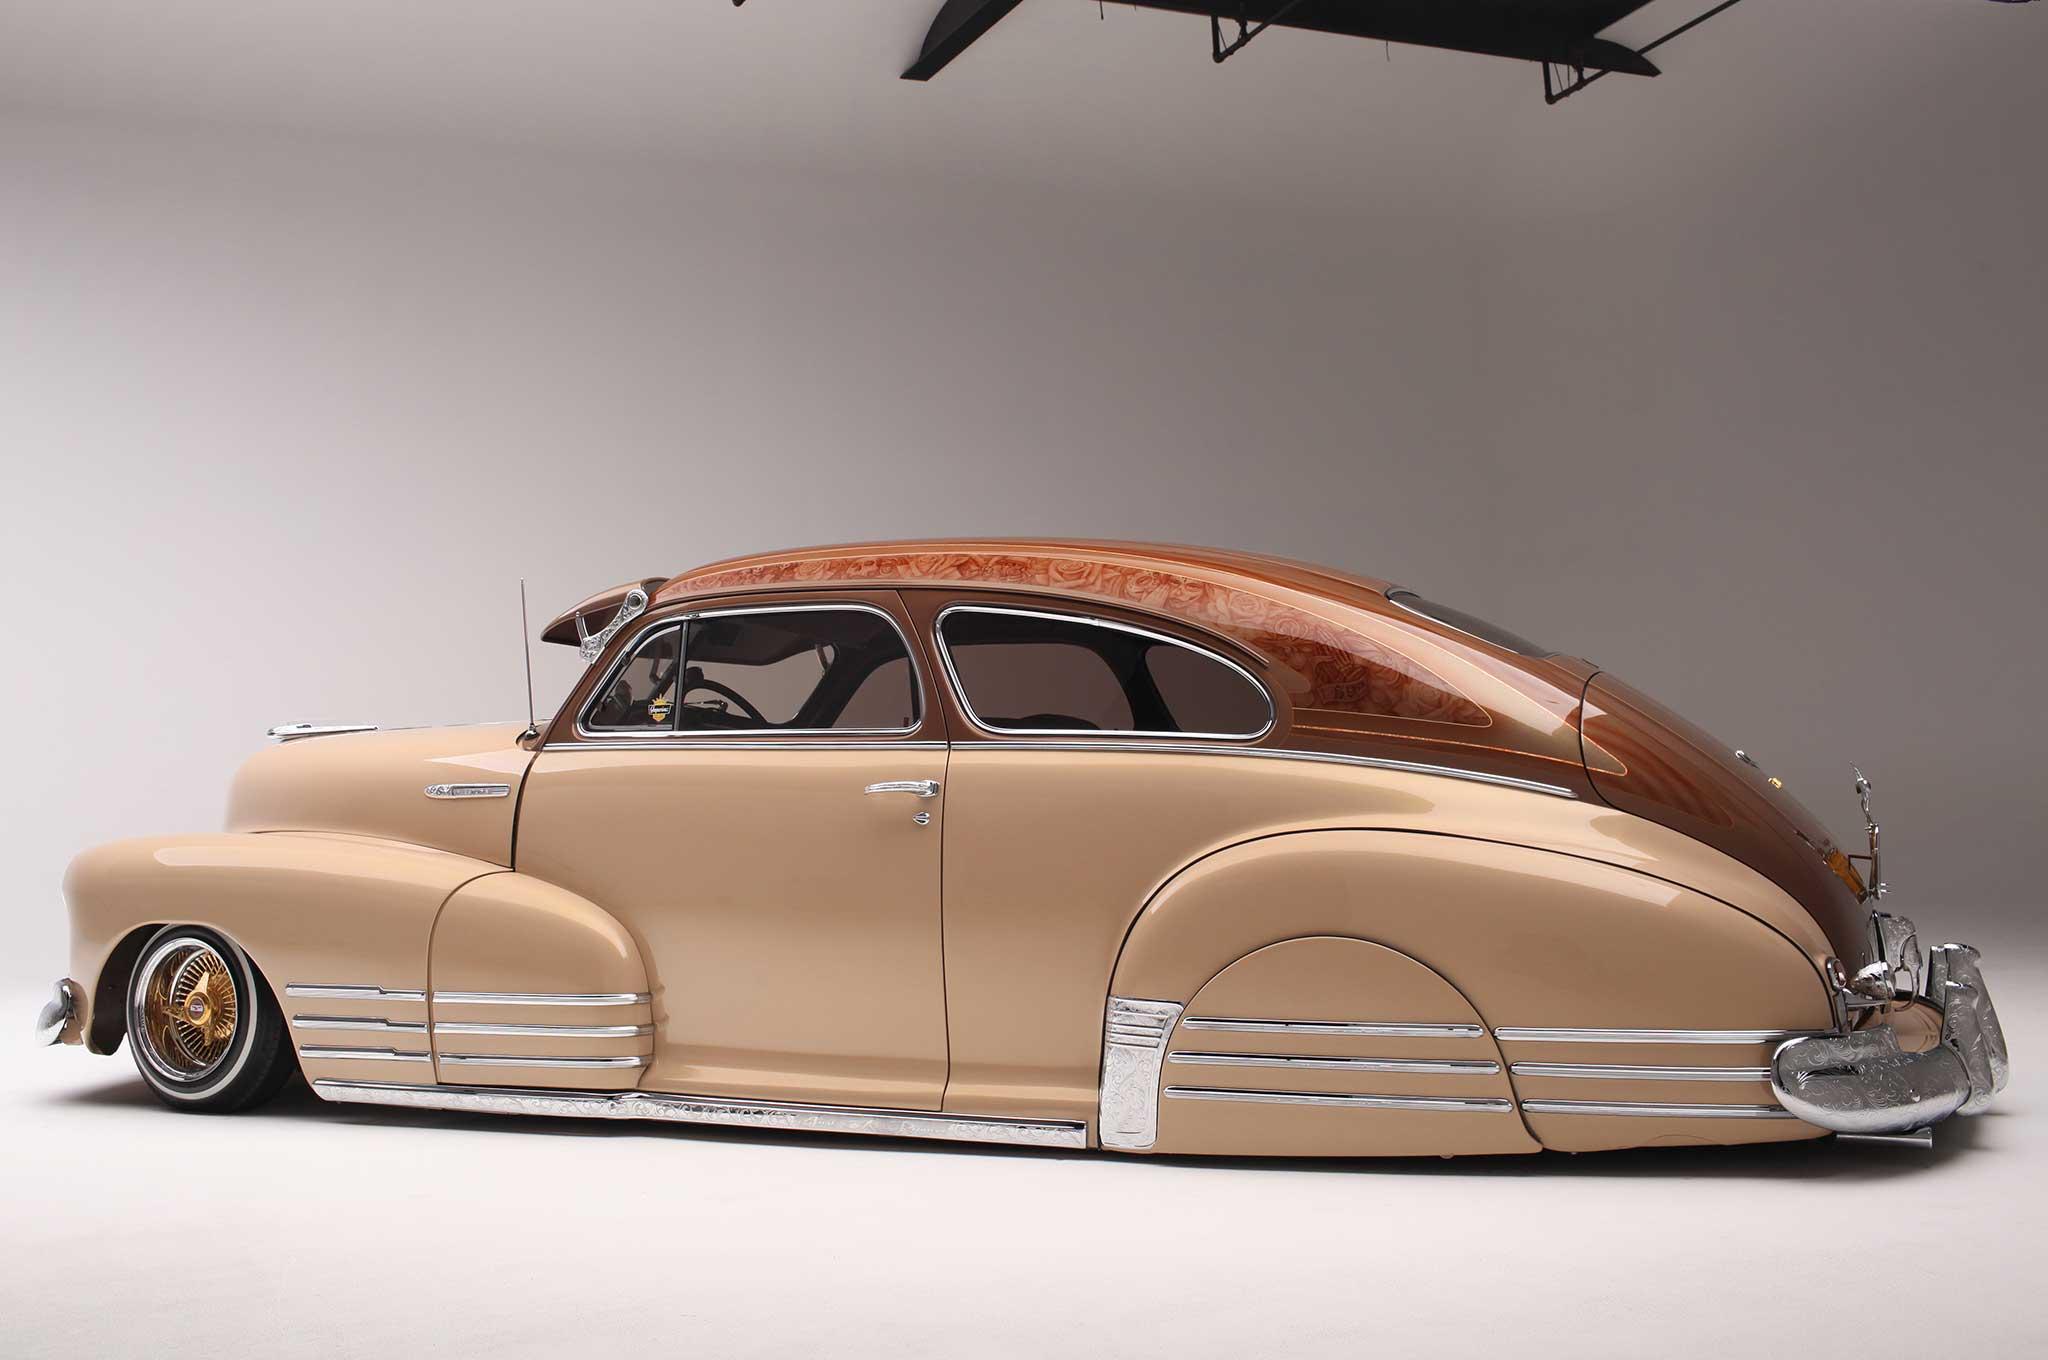 1947 chevy fleetline driver side profile 013